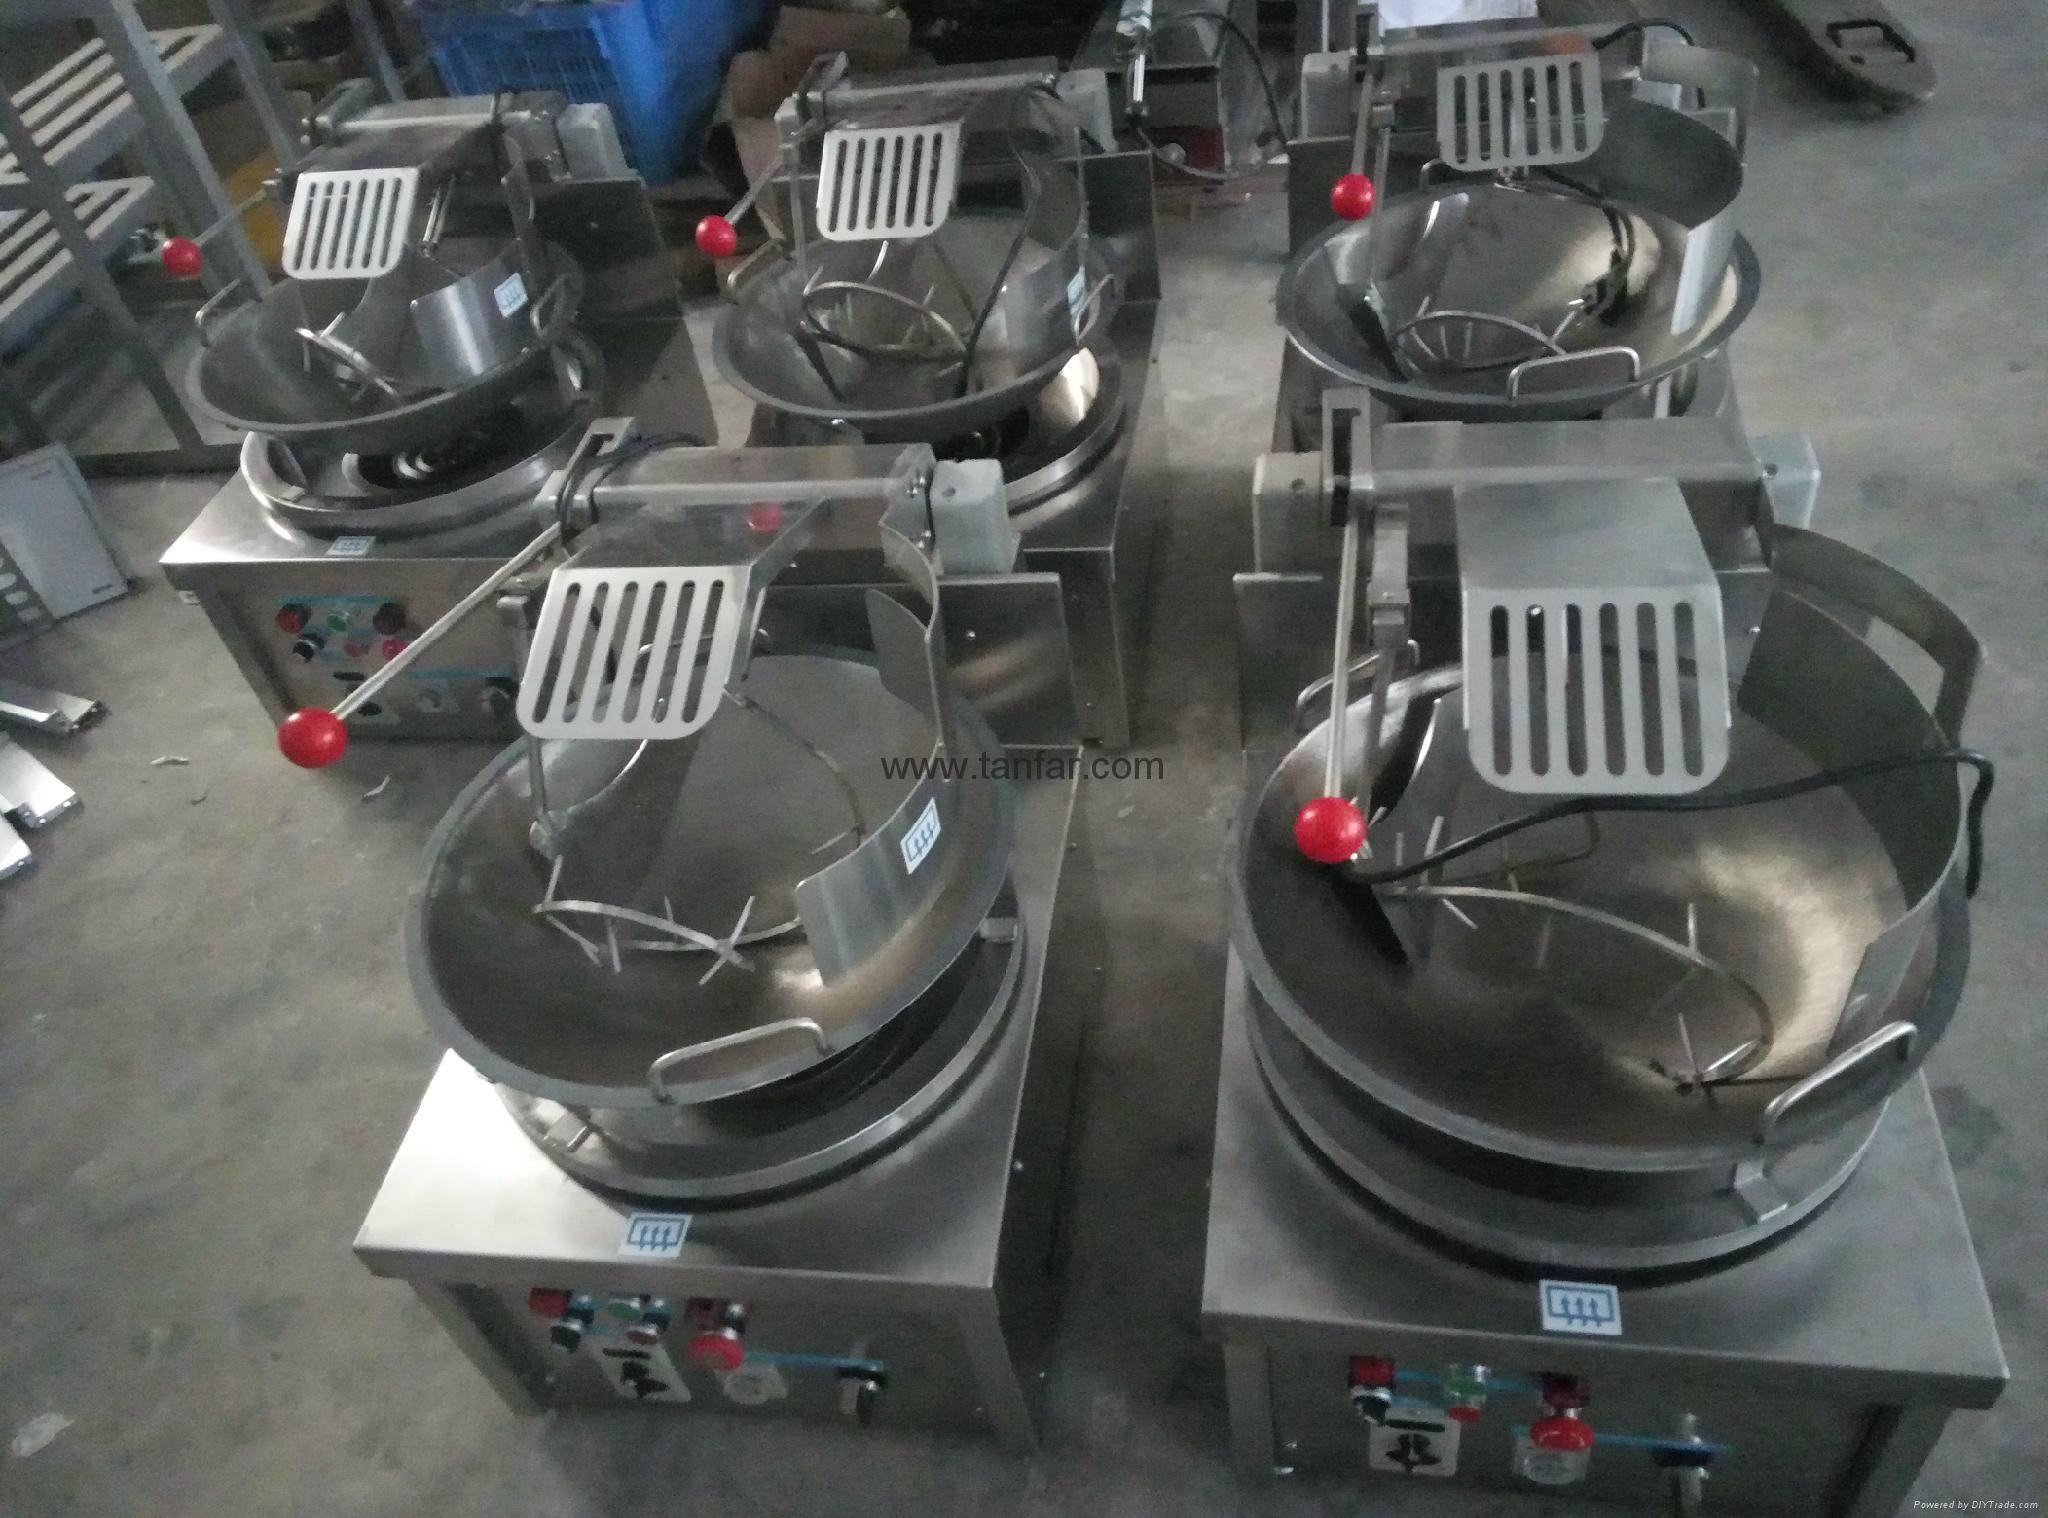 Suzumo SVC-ATC (Automatic Sushi Rolls Cutter) 17